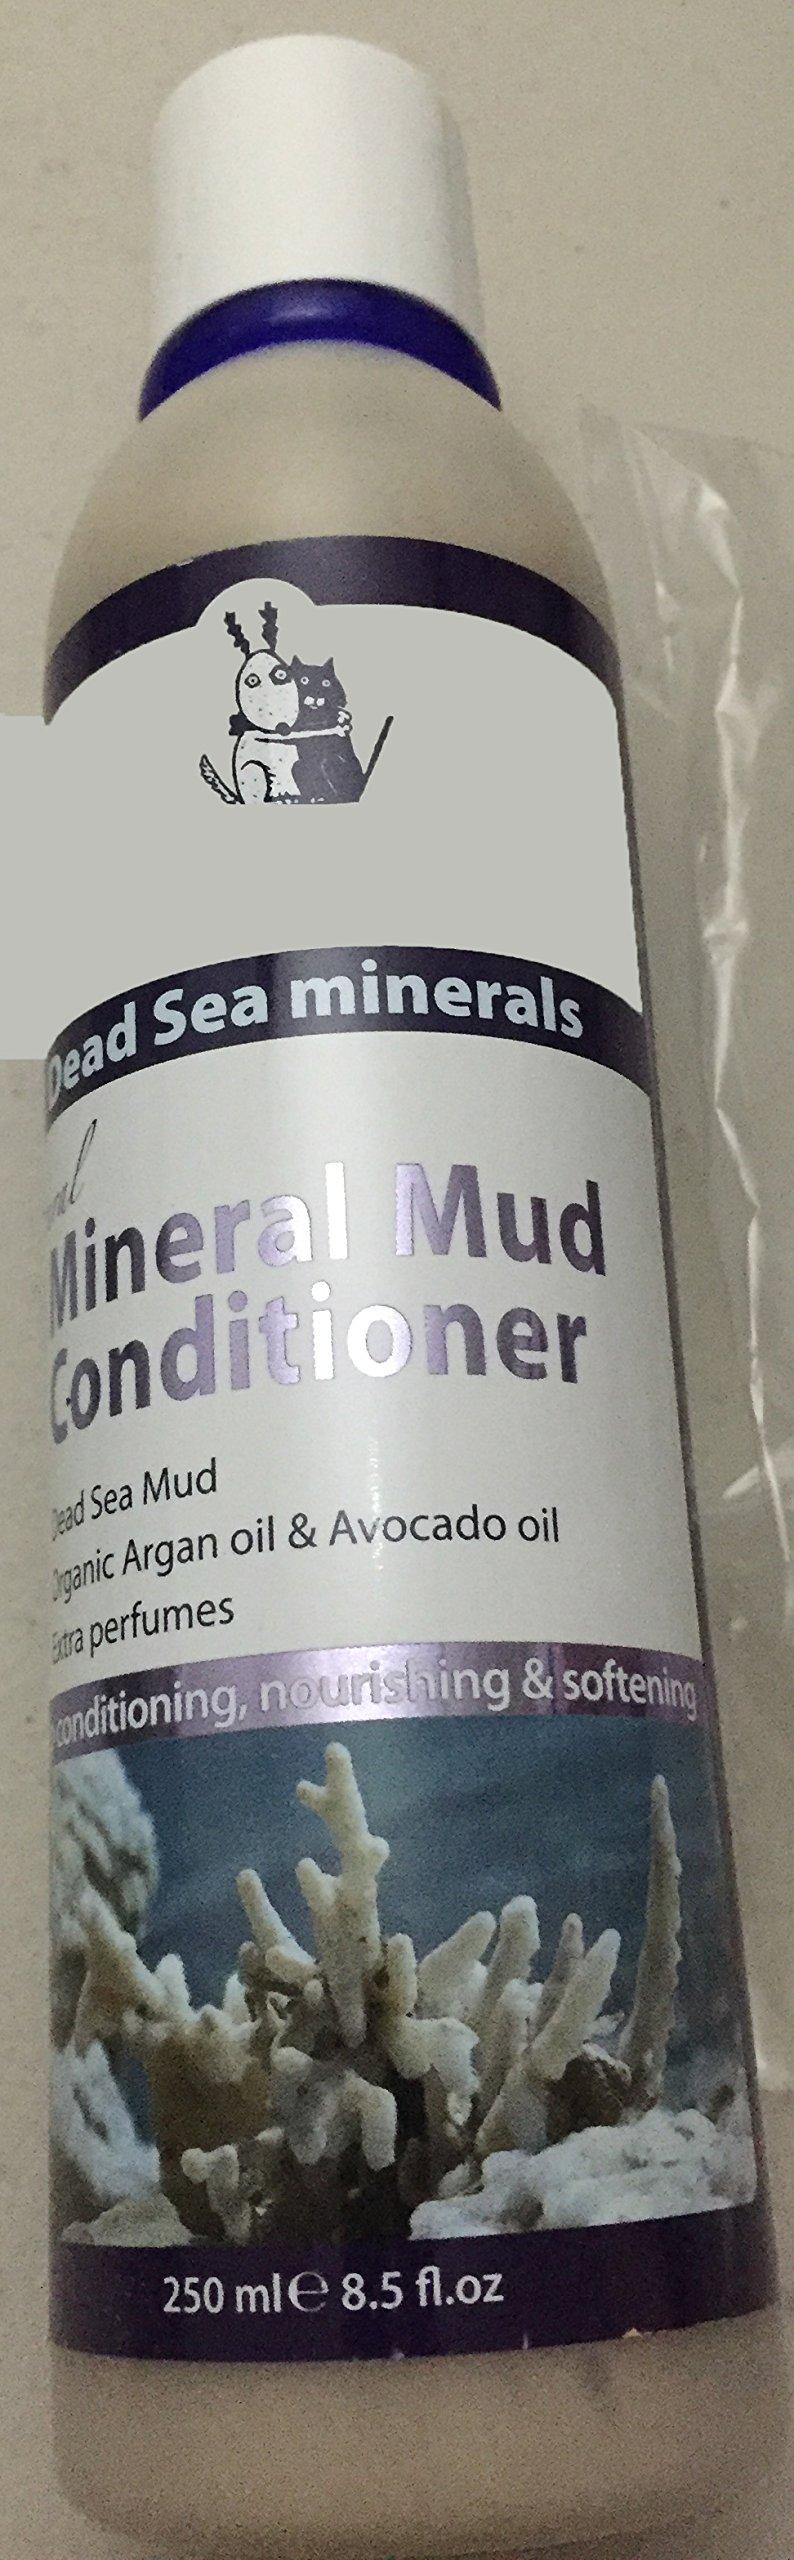 Pet Dead Sea Mineral MUD Conditioner-Deep Conditioning Nourishing & Softening